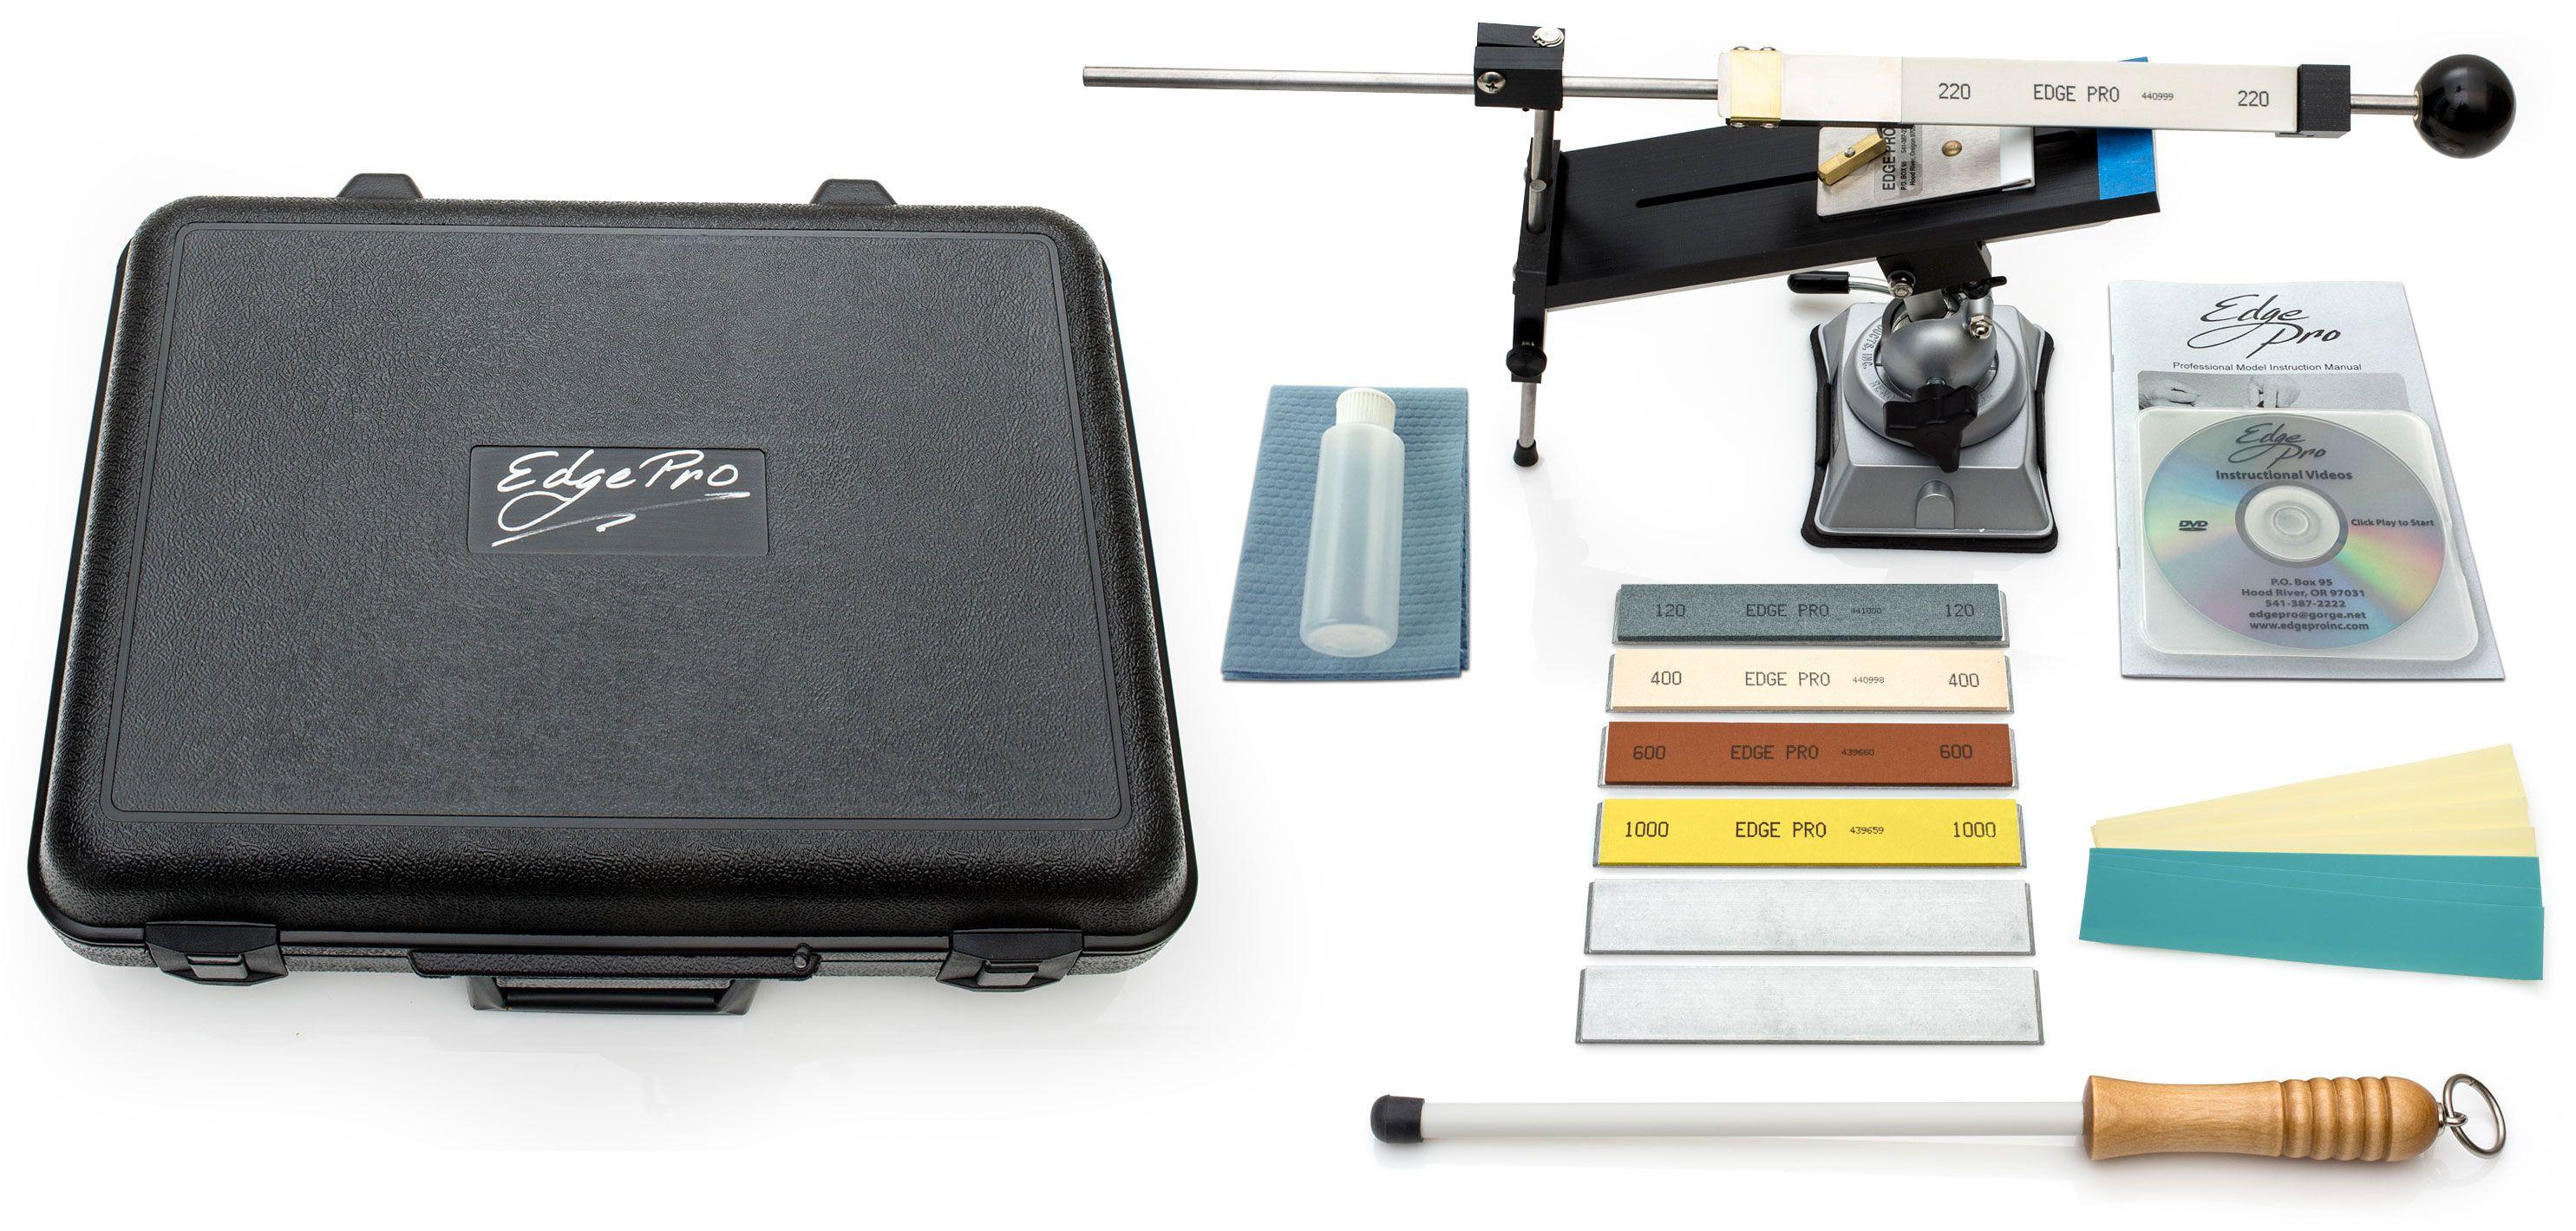 Edge Pro Professional 3 Knife Sharpening System